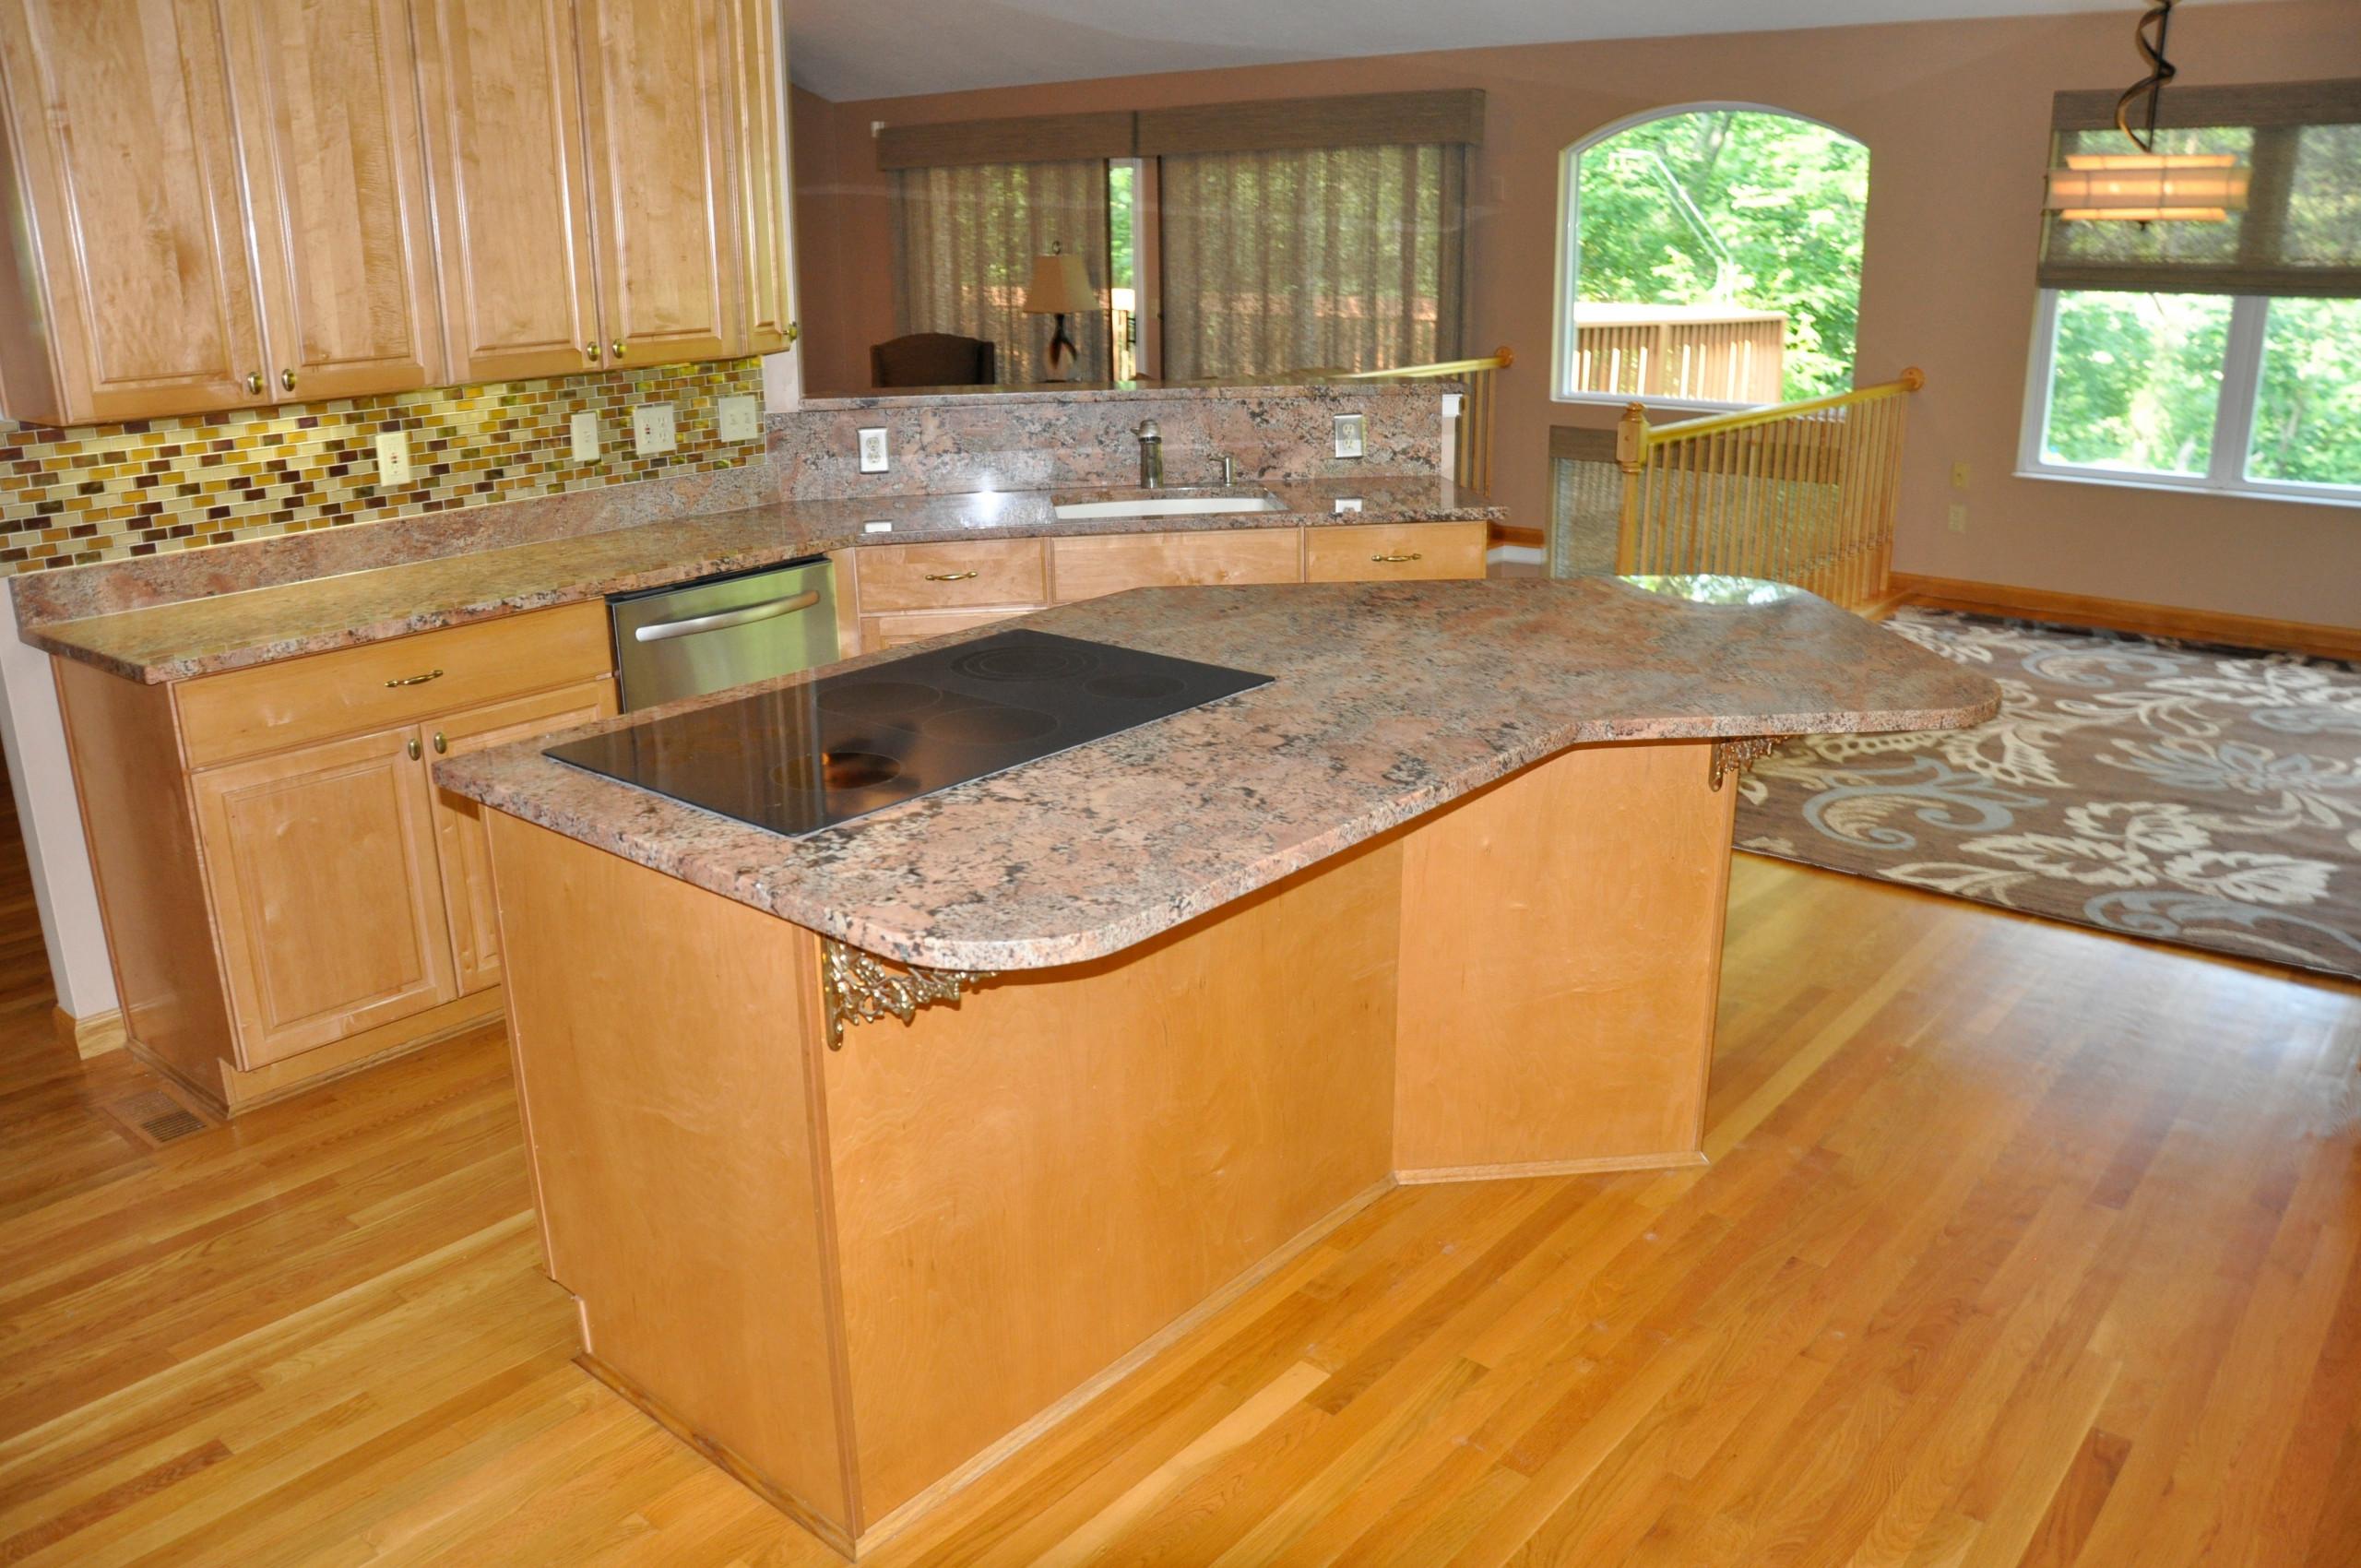 Kitchens and Back splashes